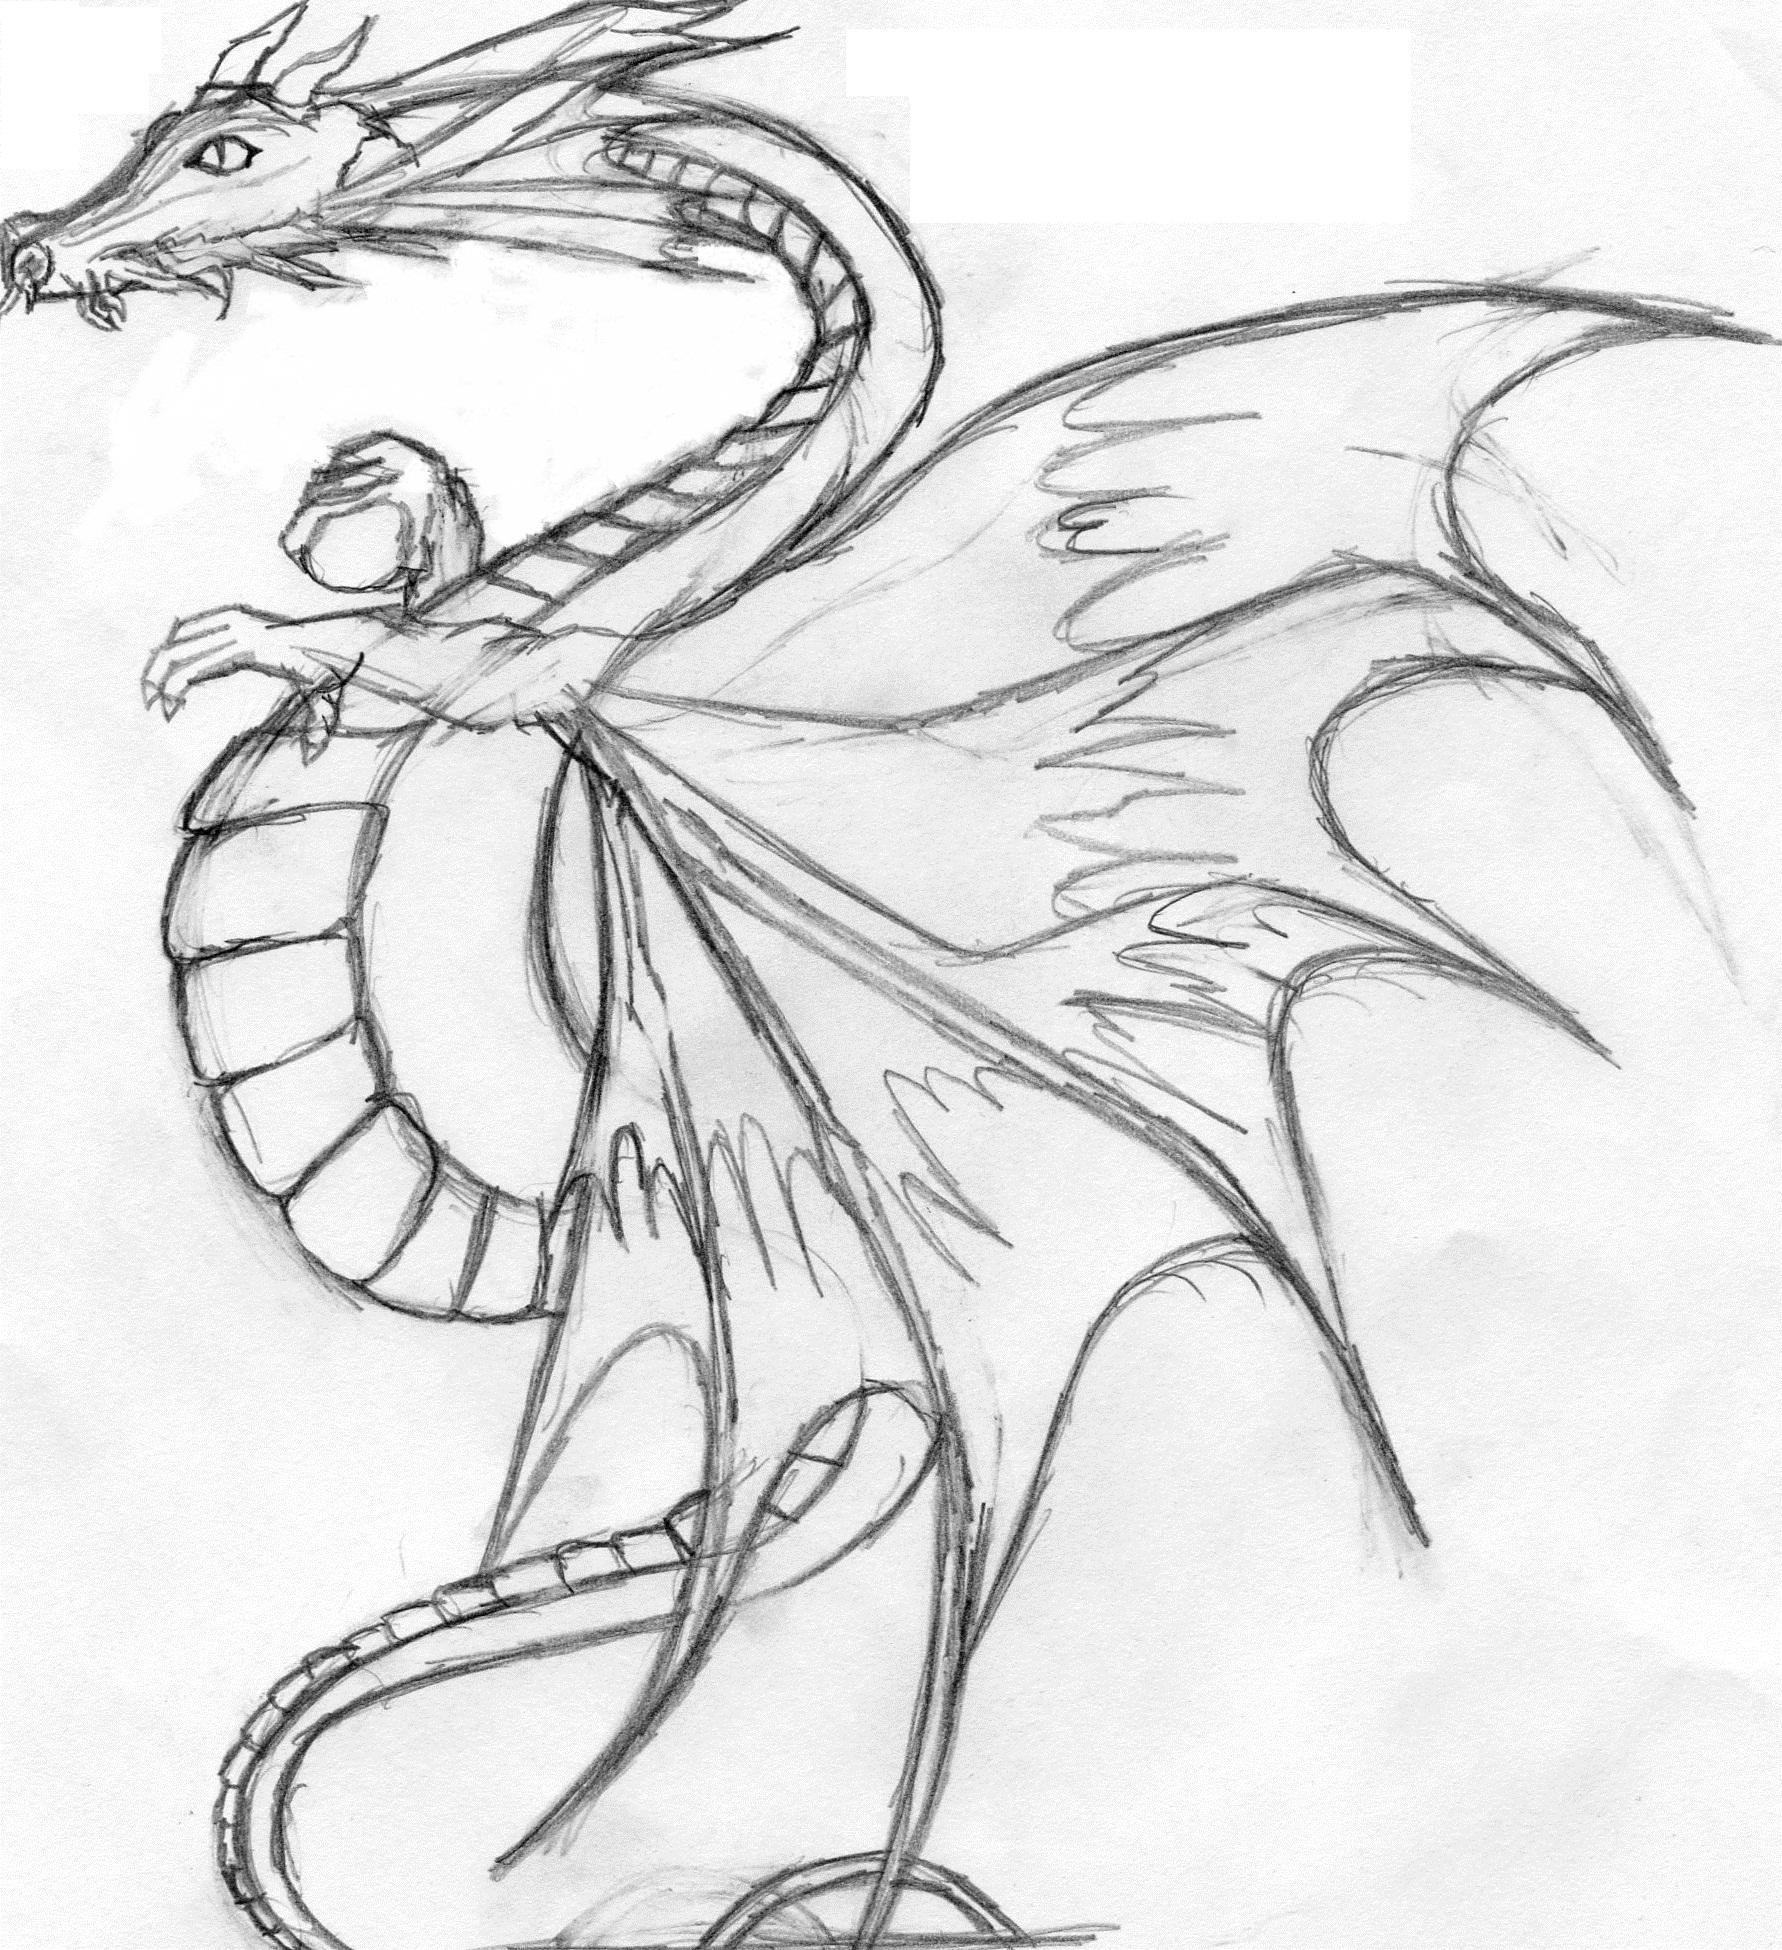 Espace membre galerie de gen77 - Dessiner dragon ...